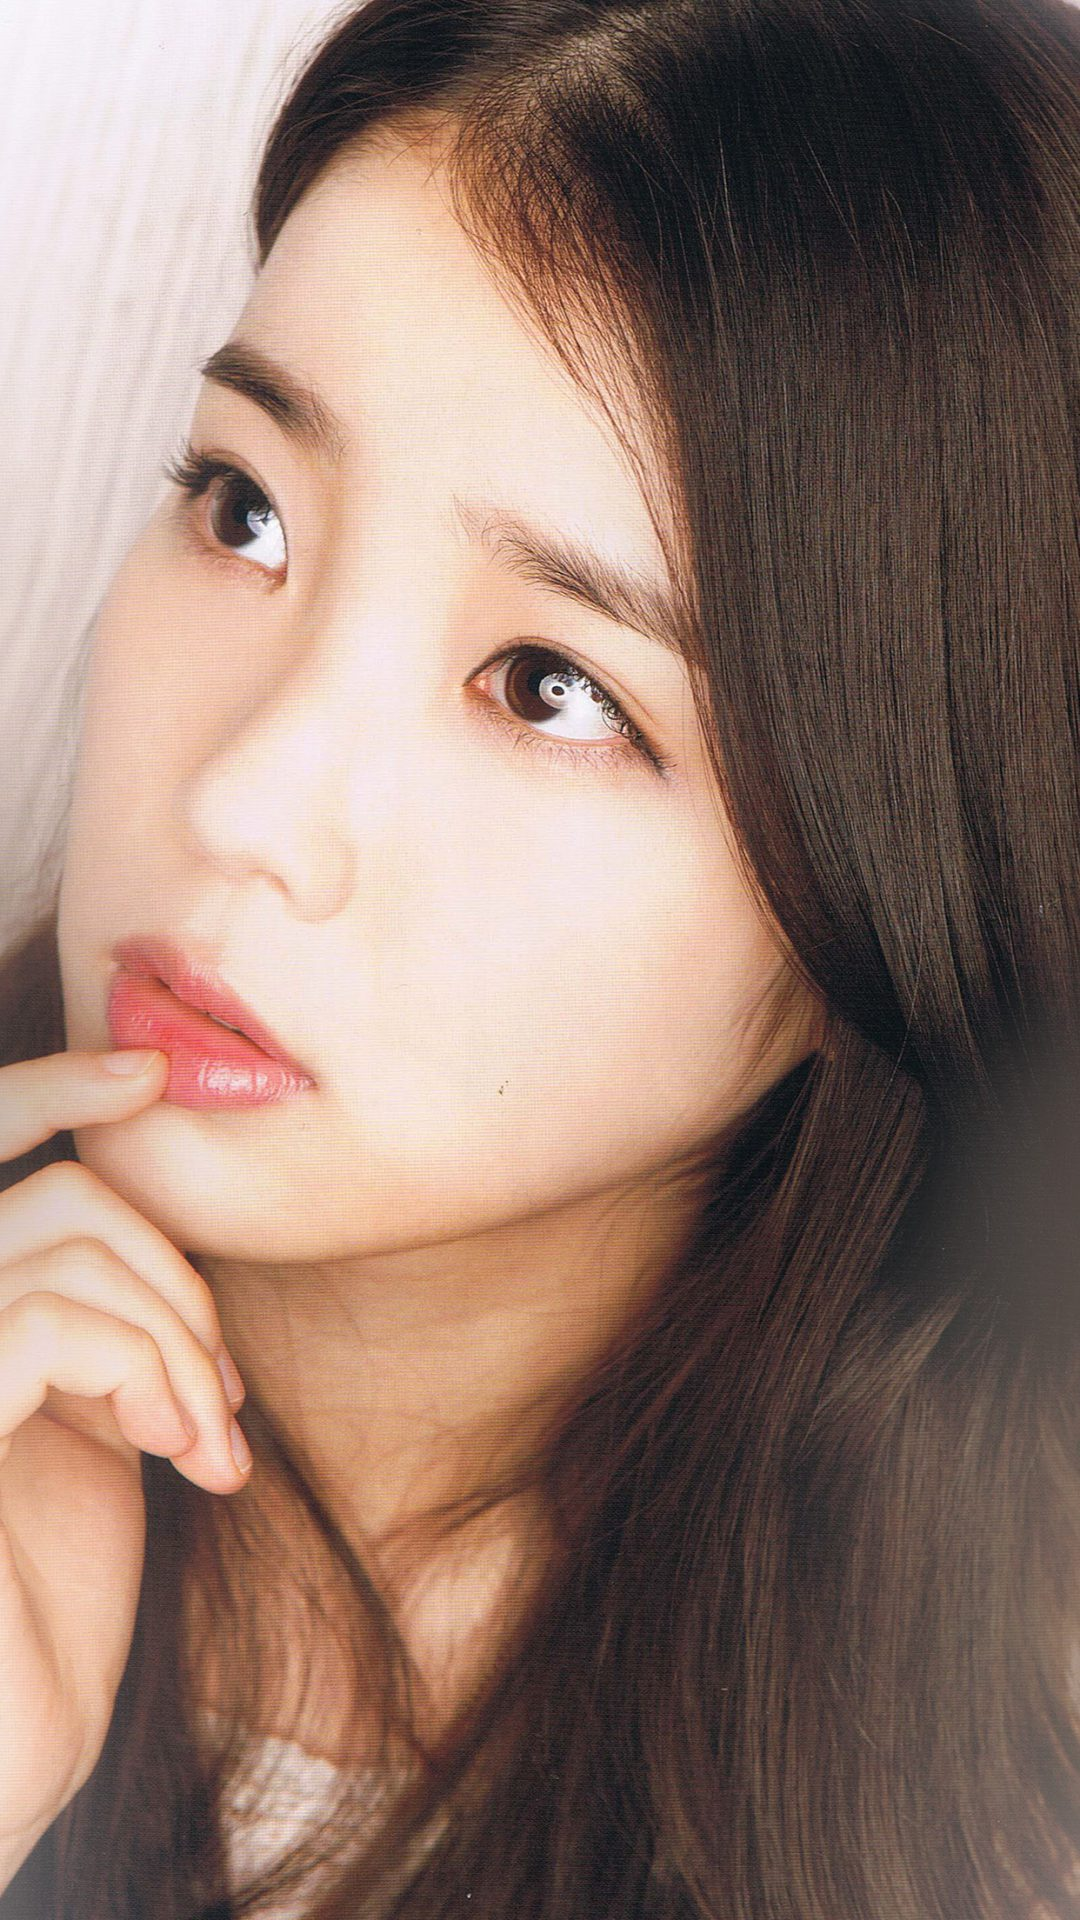 Kpop Iu Girl Music Cute